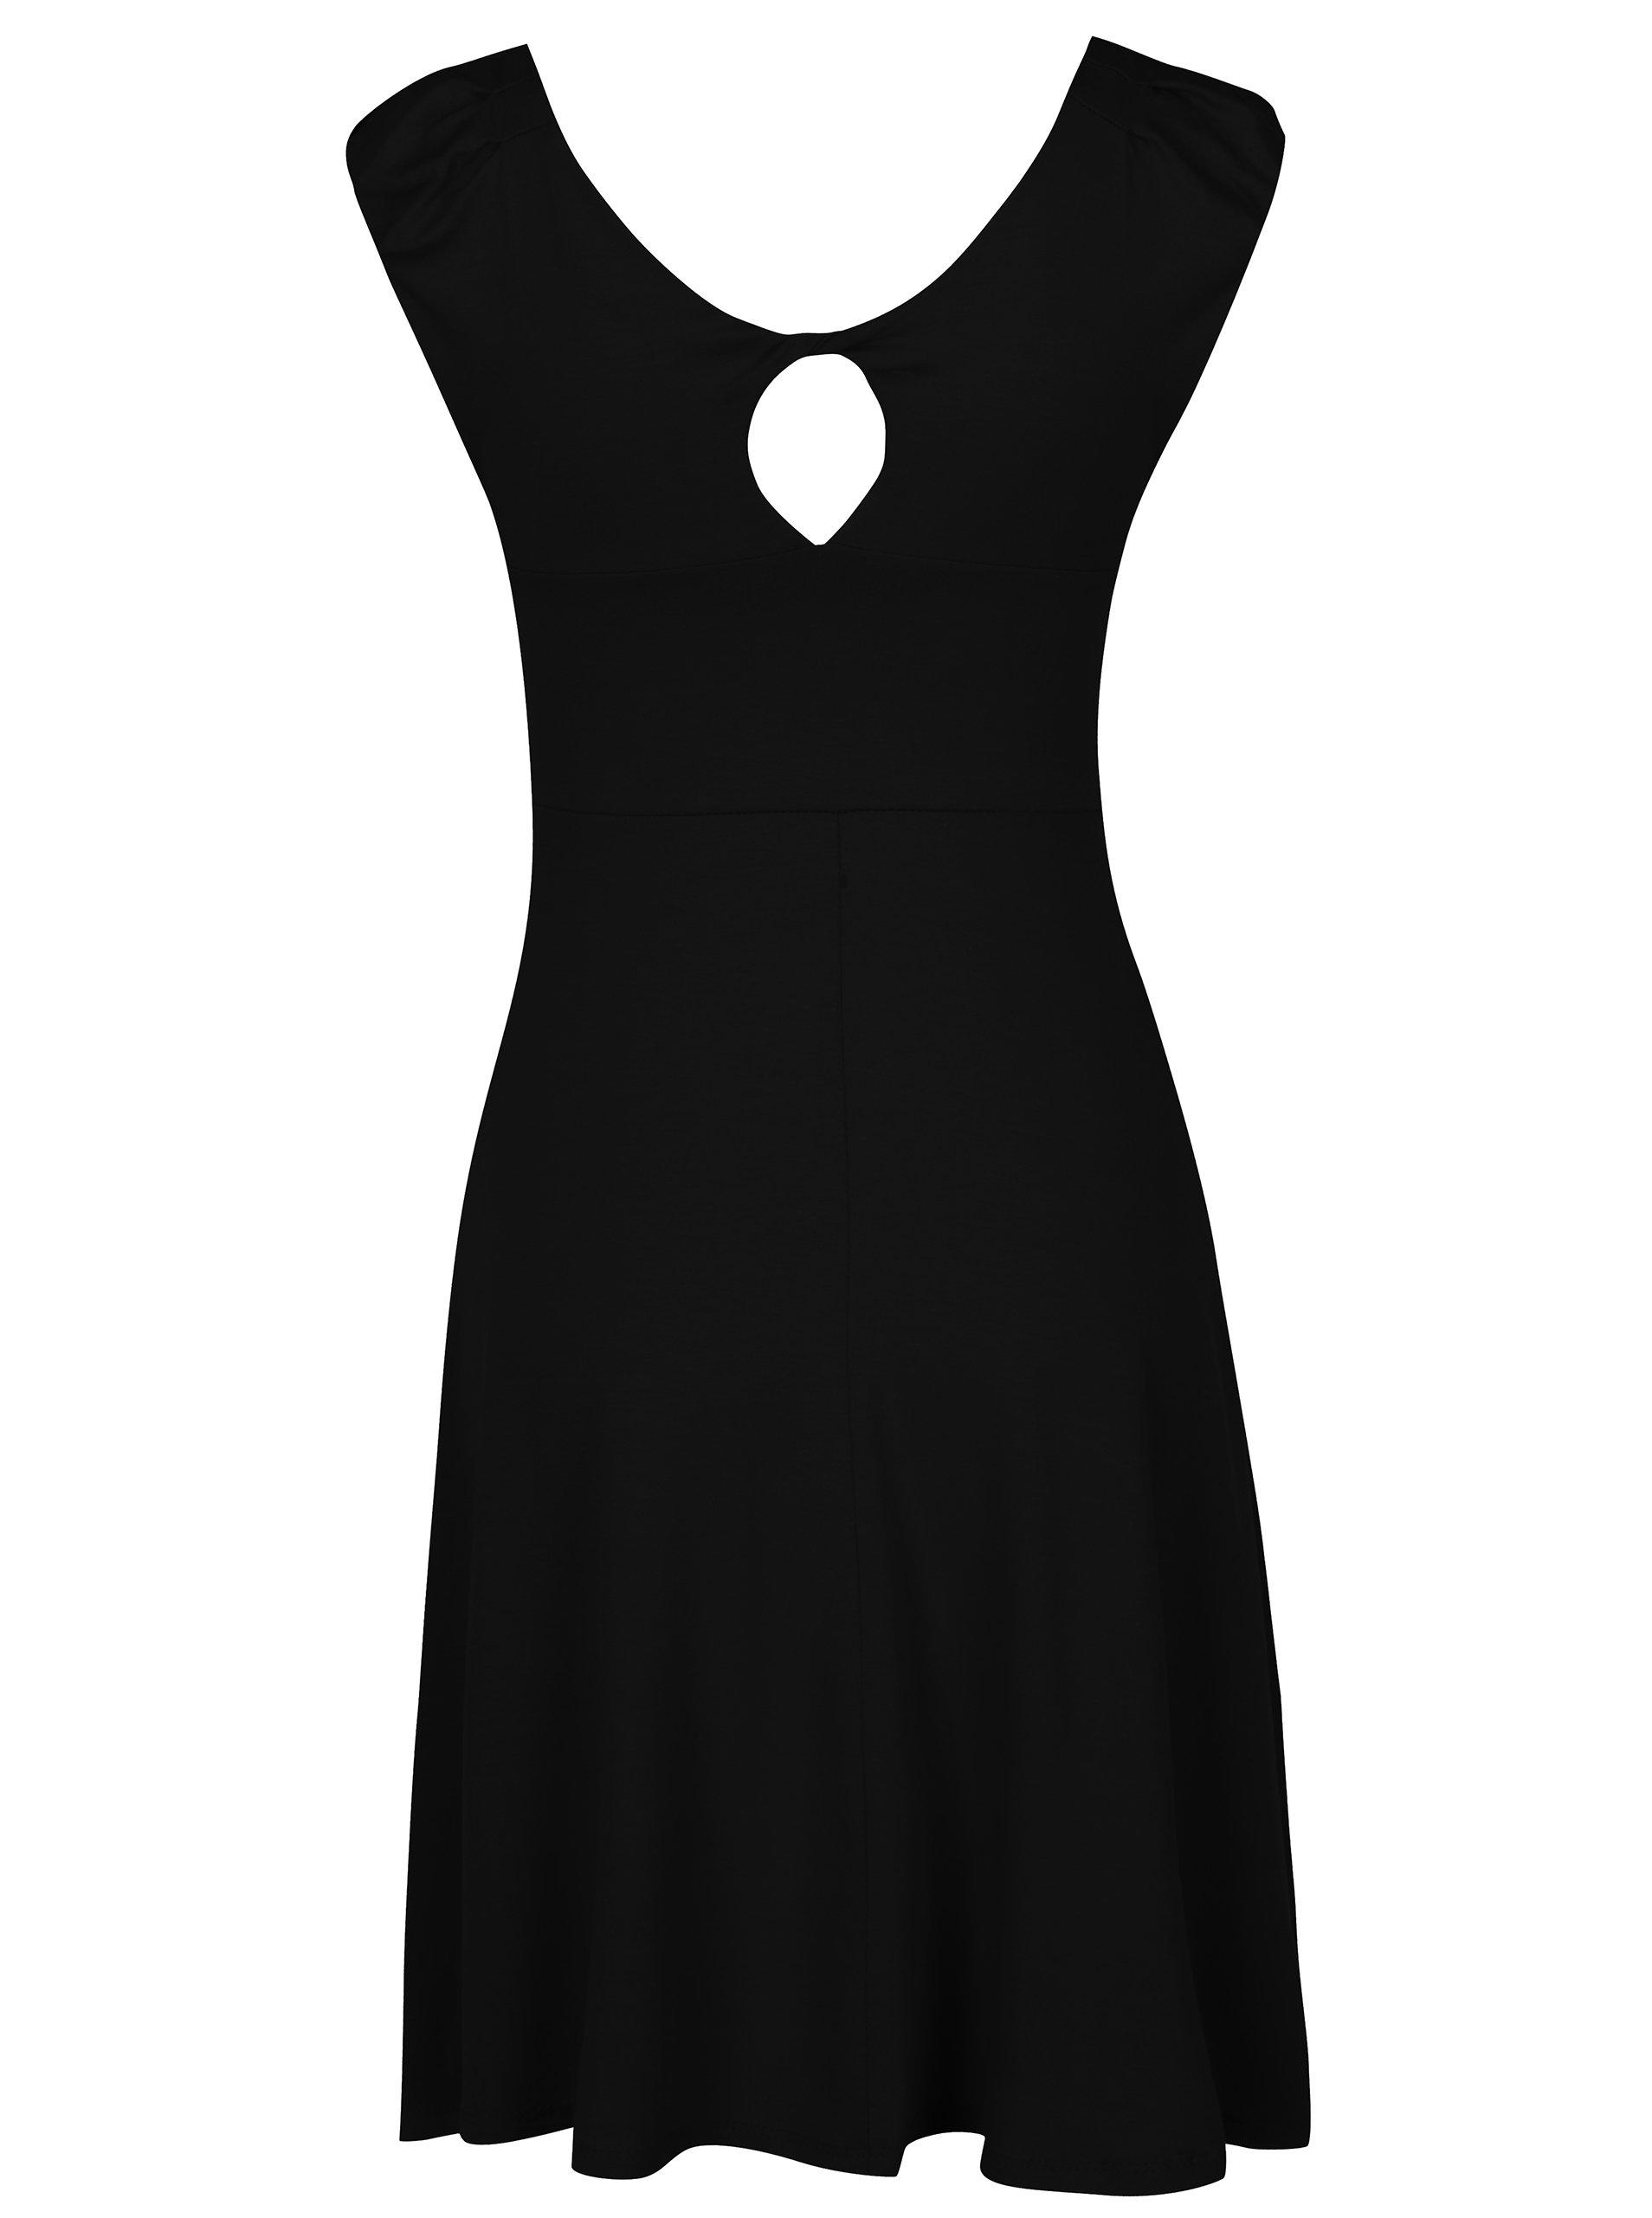 573f6f41985a Čierne šaty s uzlom v dekolte ZOOT ...